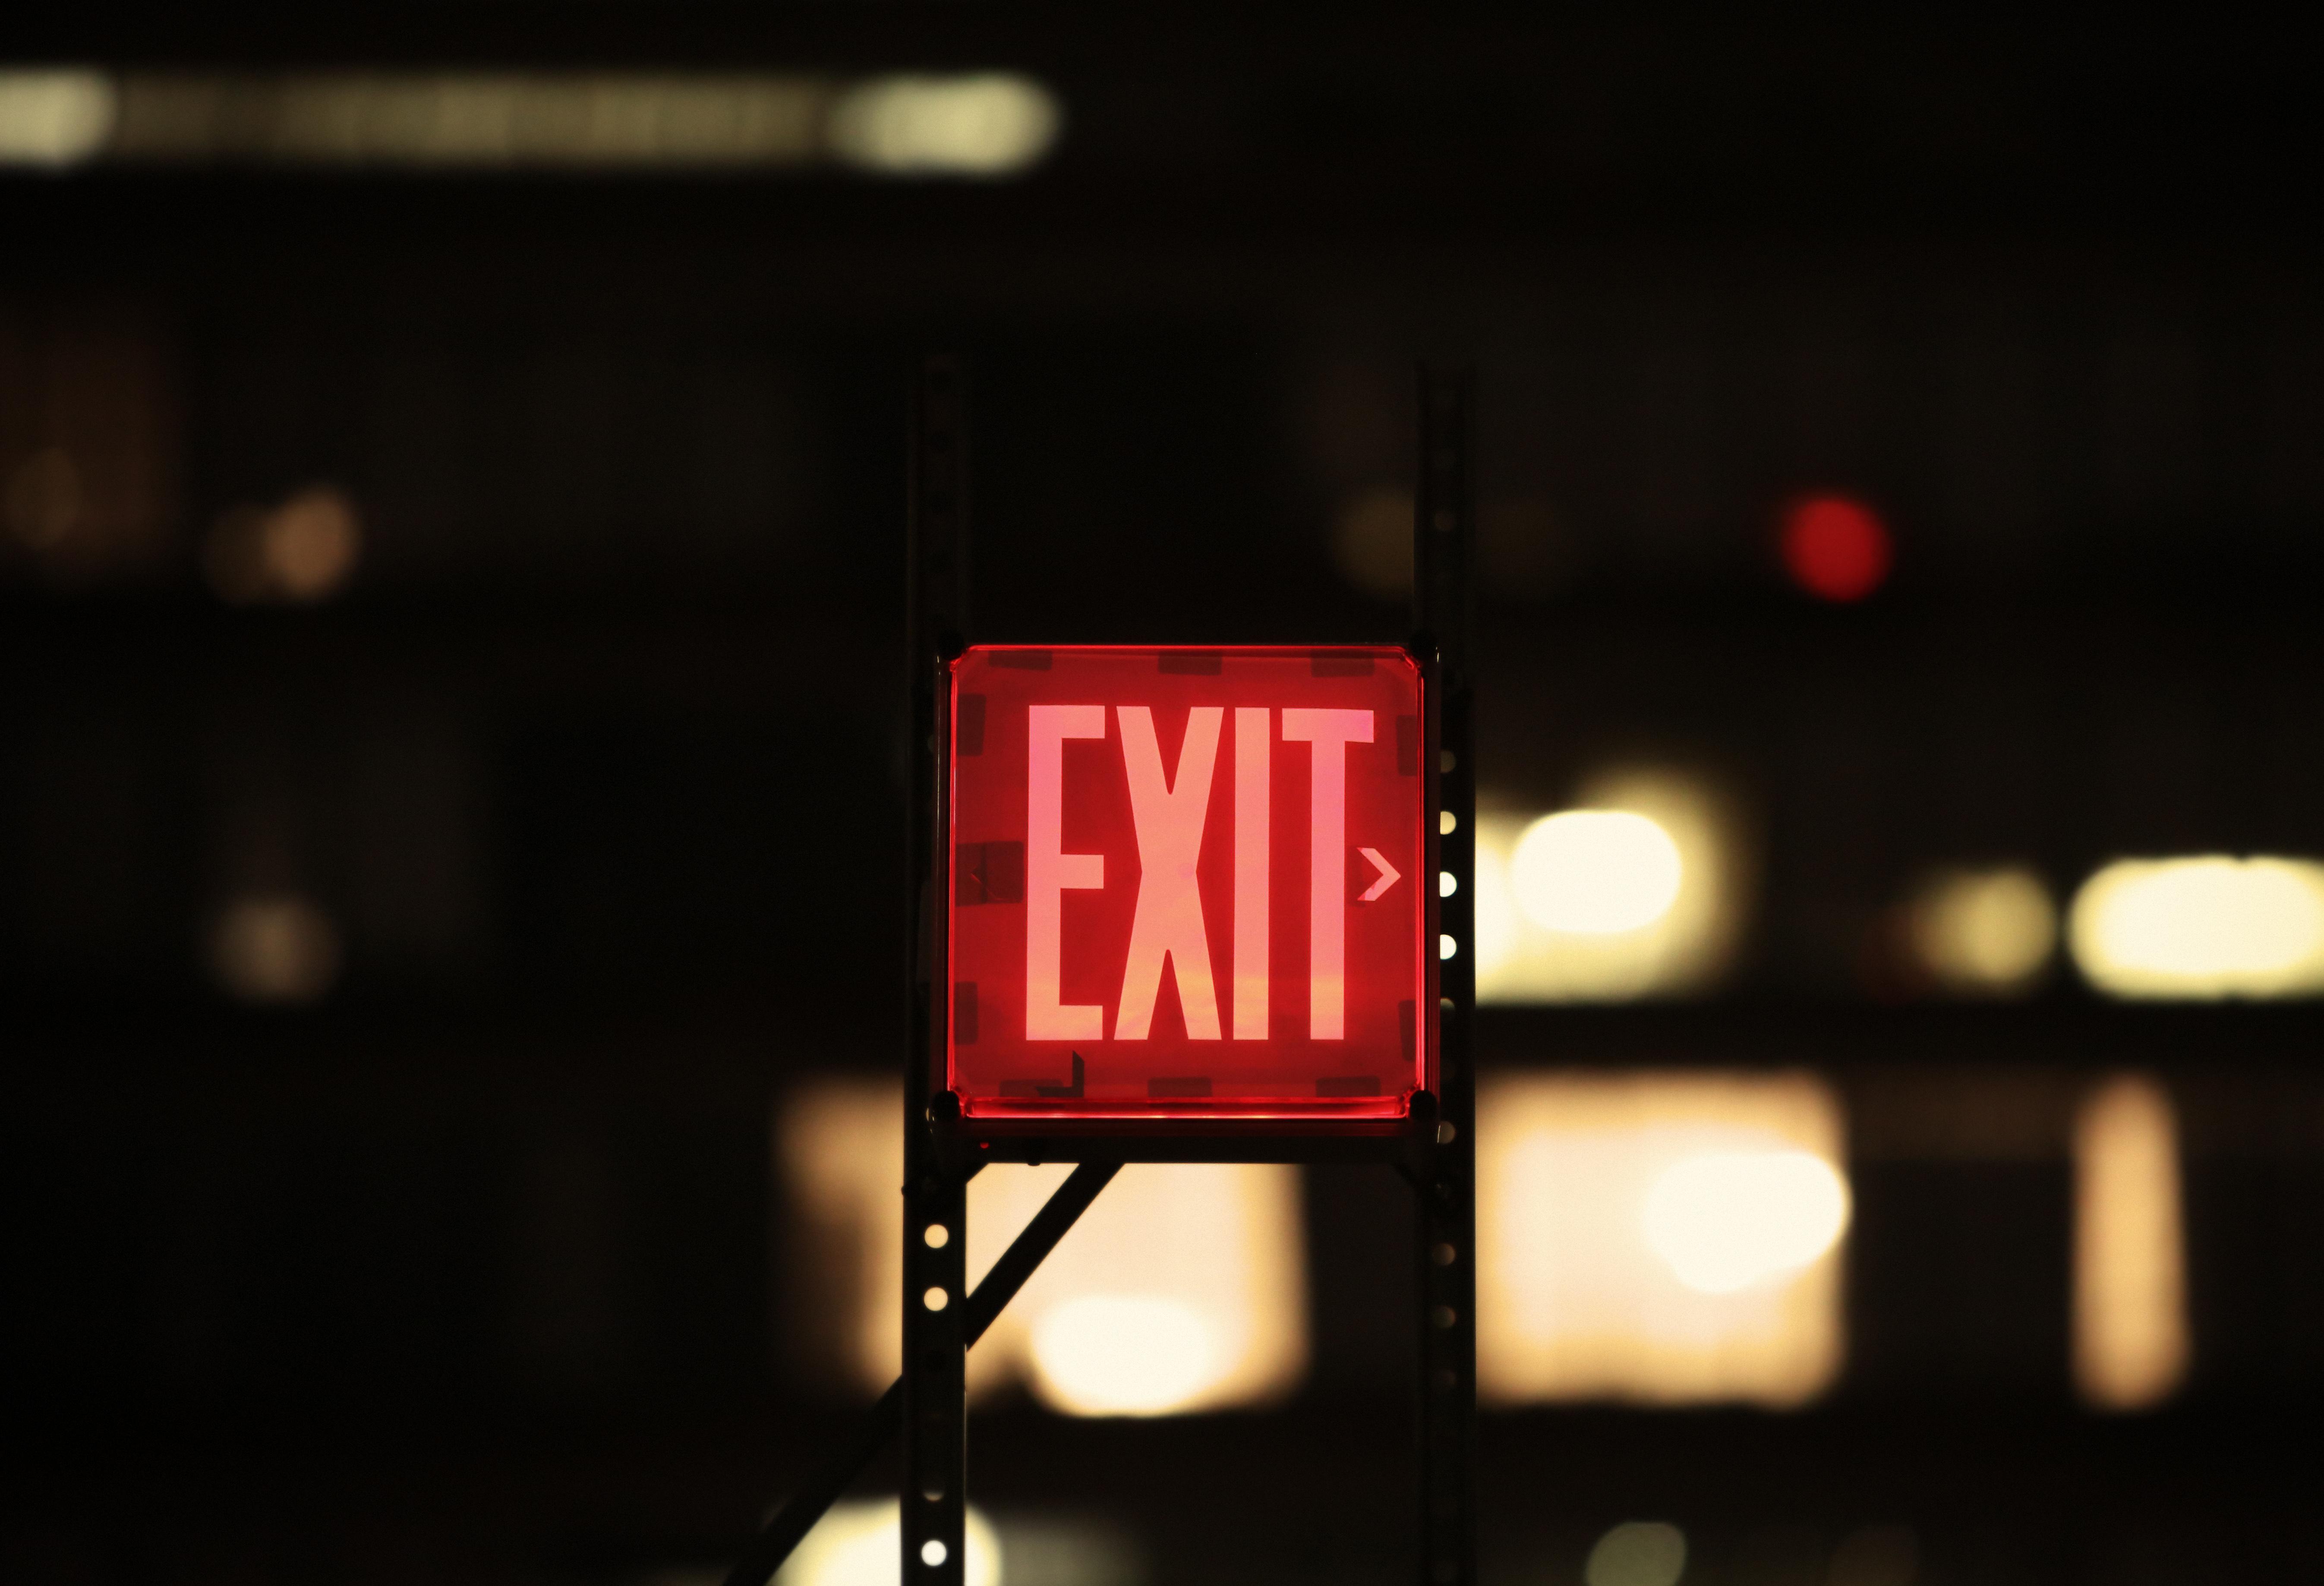 Exit Free Stock Photos Life Of Pix